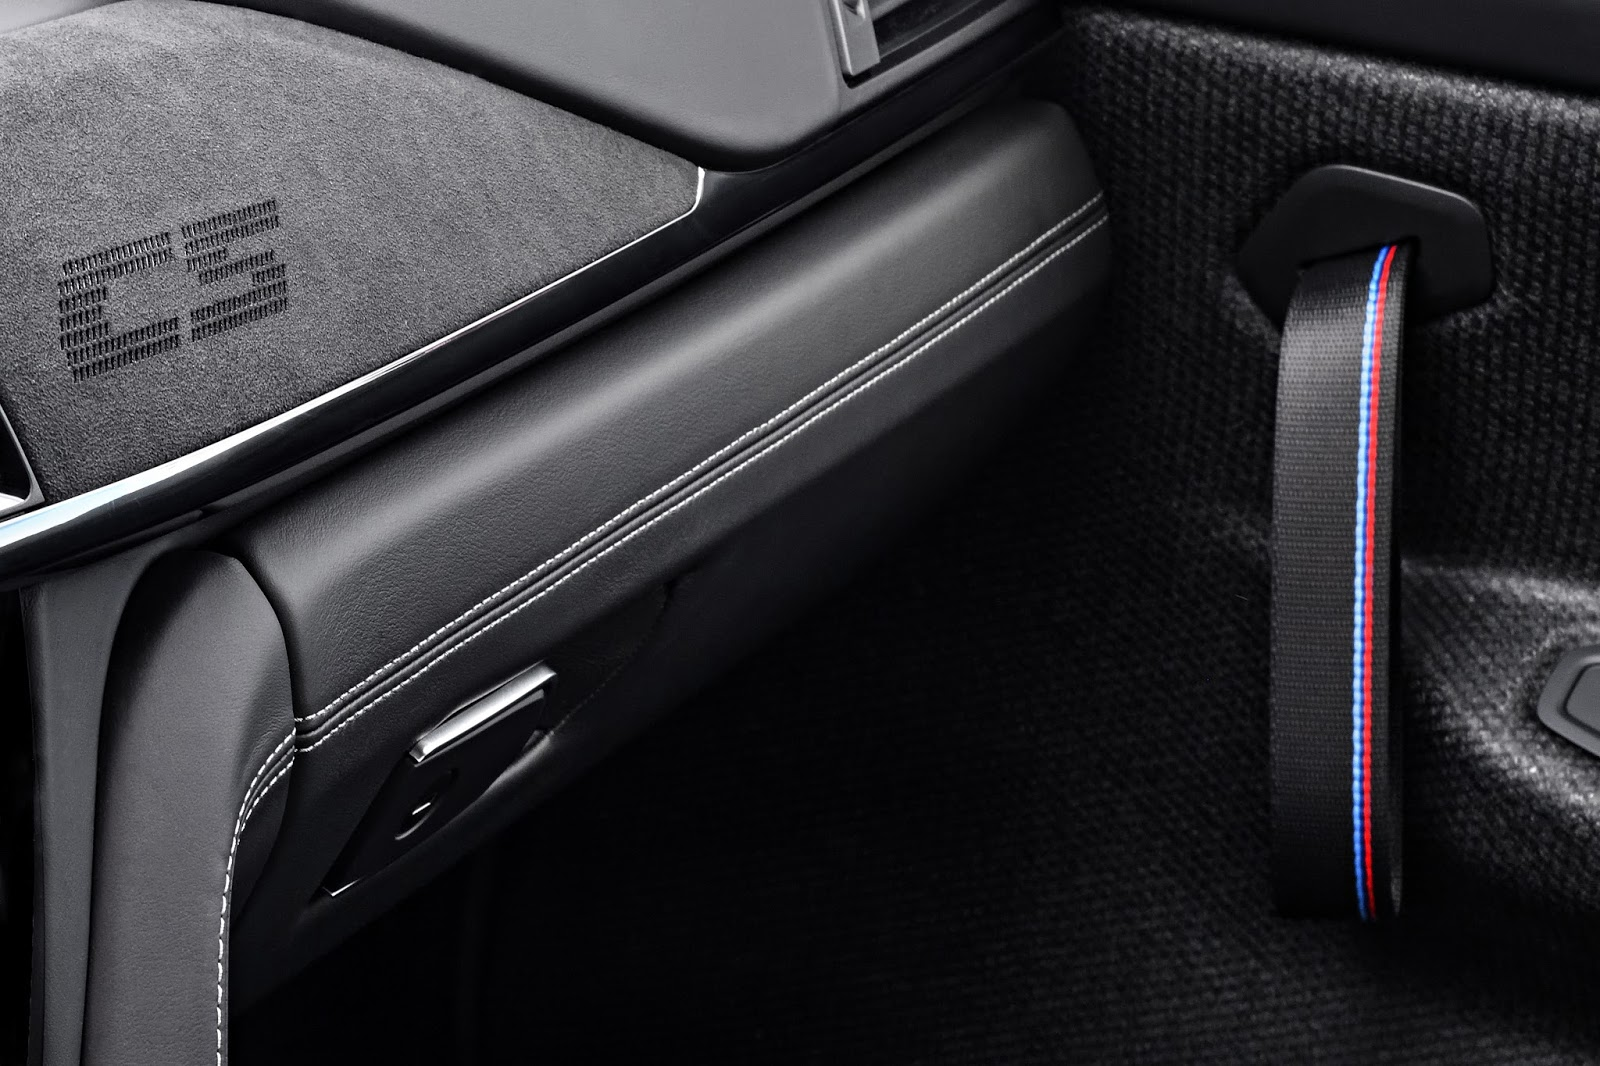 P90251061 highRes the new bmw m4 cs 04 Η περιορισμένης παραγωγής BMW M4 ClubSport δική σας με 116.900 ευρώ BMW, BMW M, BMW M4, BMW M4 CS, BMW Motorsport, clubsport, COUPE, Limited edition, supercars, supersport, videos, Περιορισμένης παραγωγής